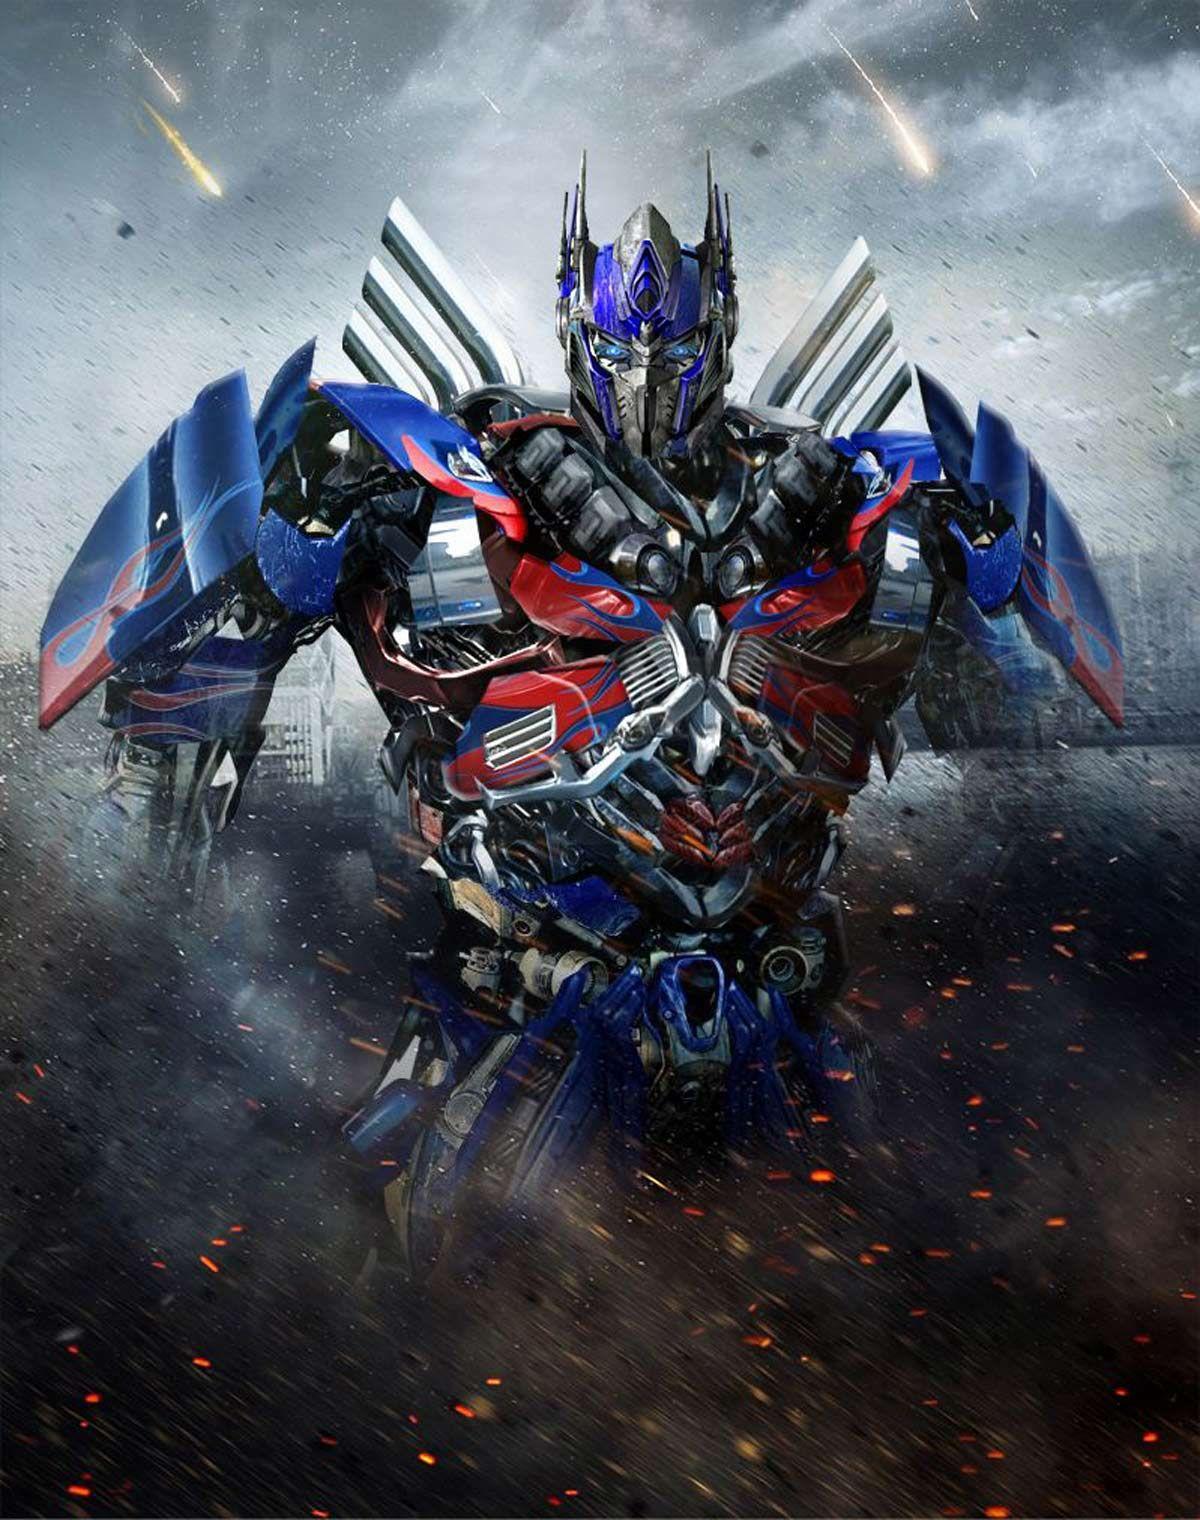 Optimus Prime Wallpapers Free Download 1200 1520 Transformer Optimus Prime Wallpapers Transformers Age Transformers Age Of Extinction Optimus Prime Wallpaper